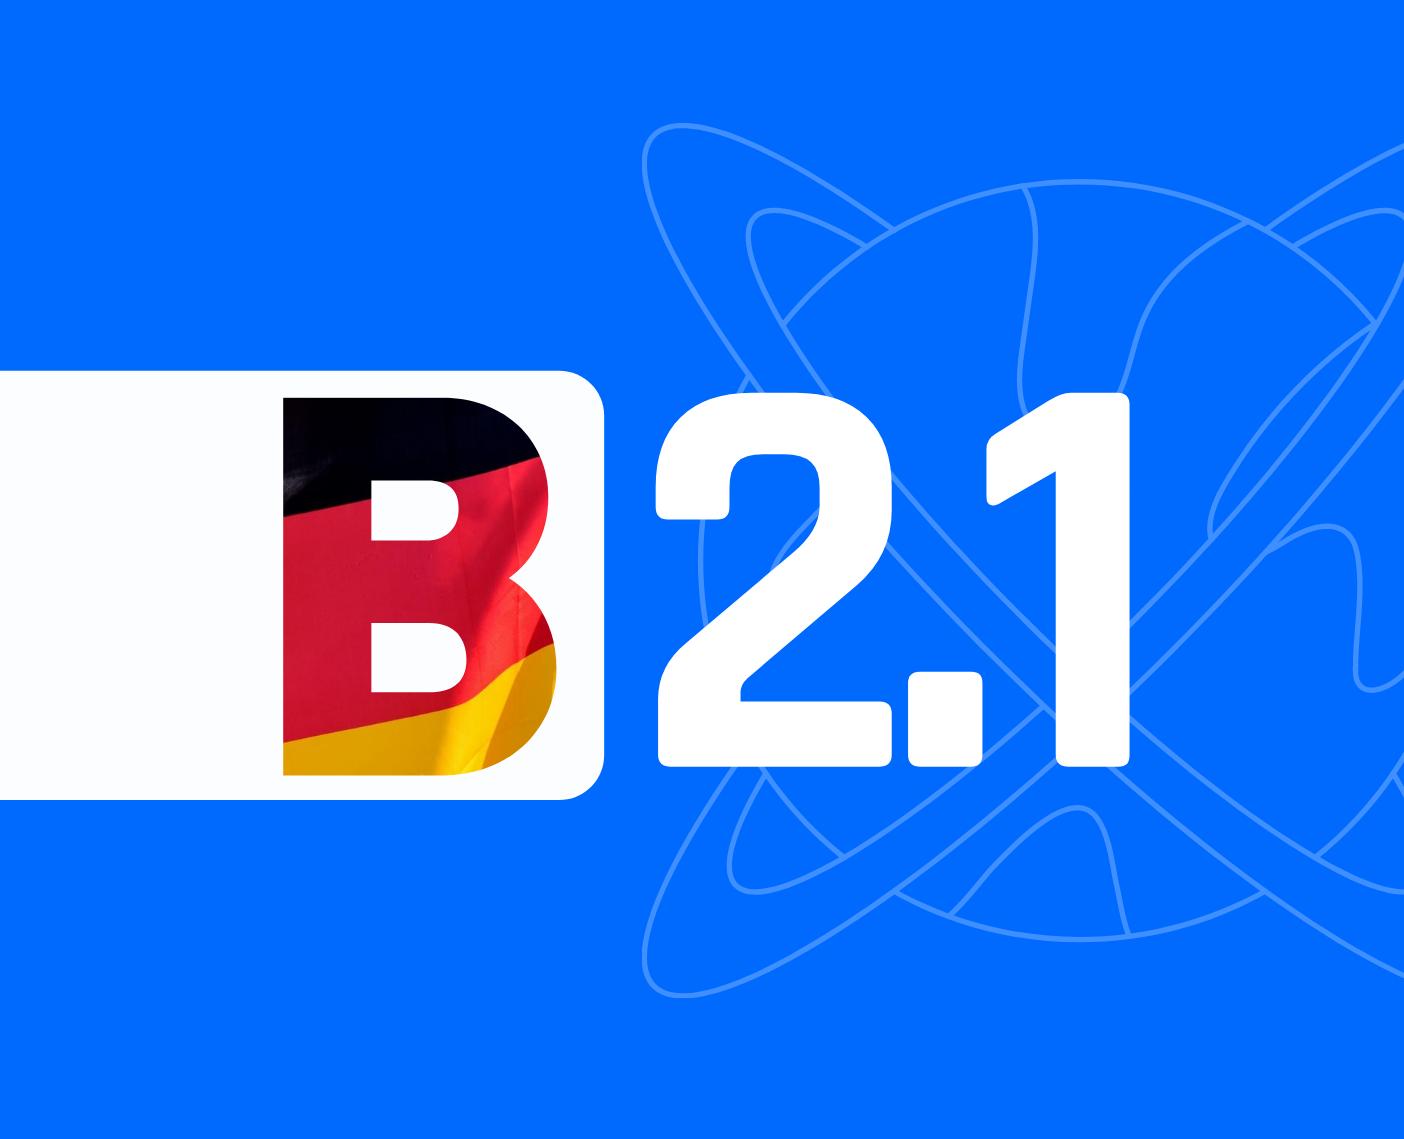 Јазичен  степен B2.1  –  За возрасни